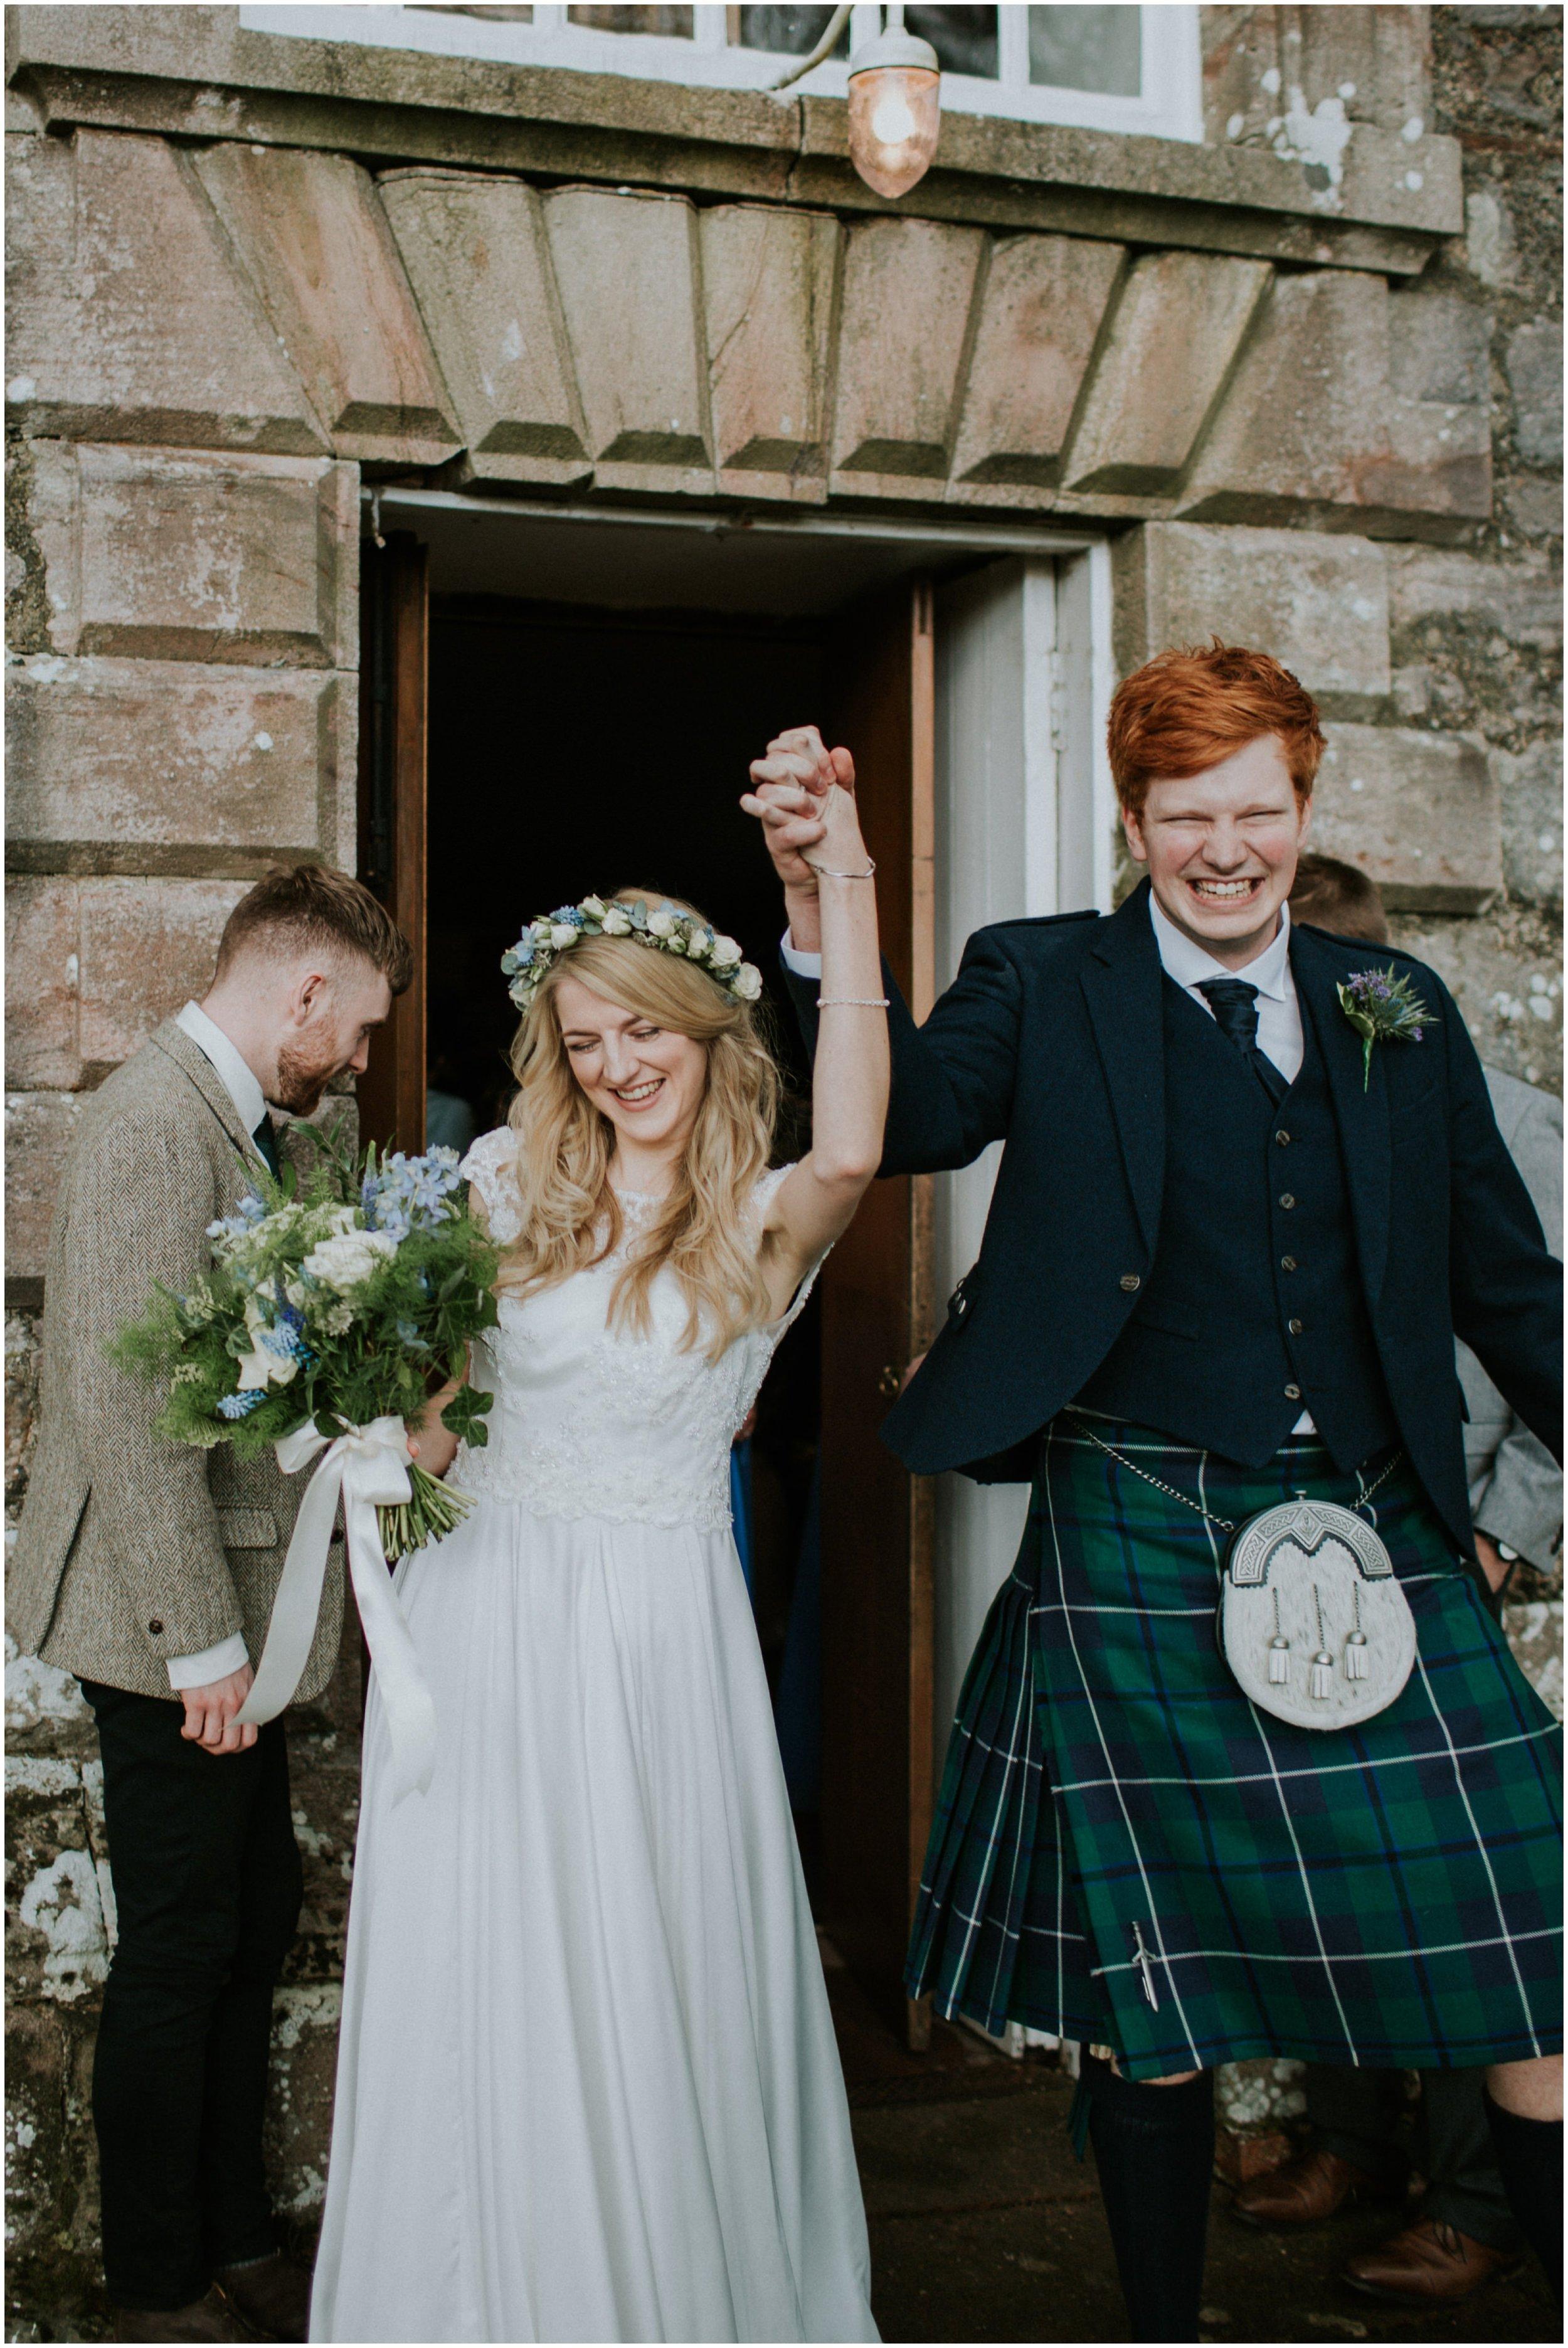 Photography 78 - Glasgow Wedding Photographer - Dave & Alana_0044.jpg